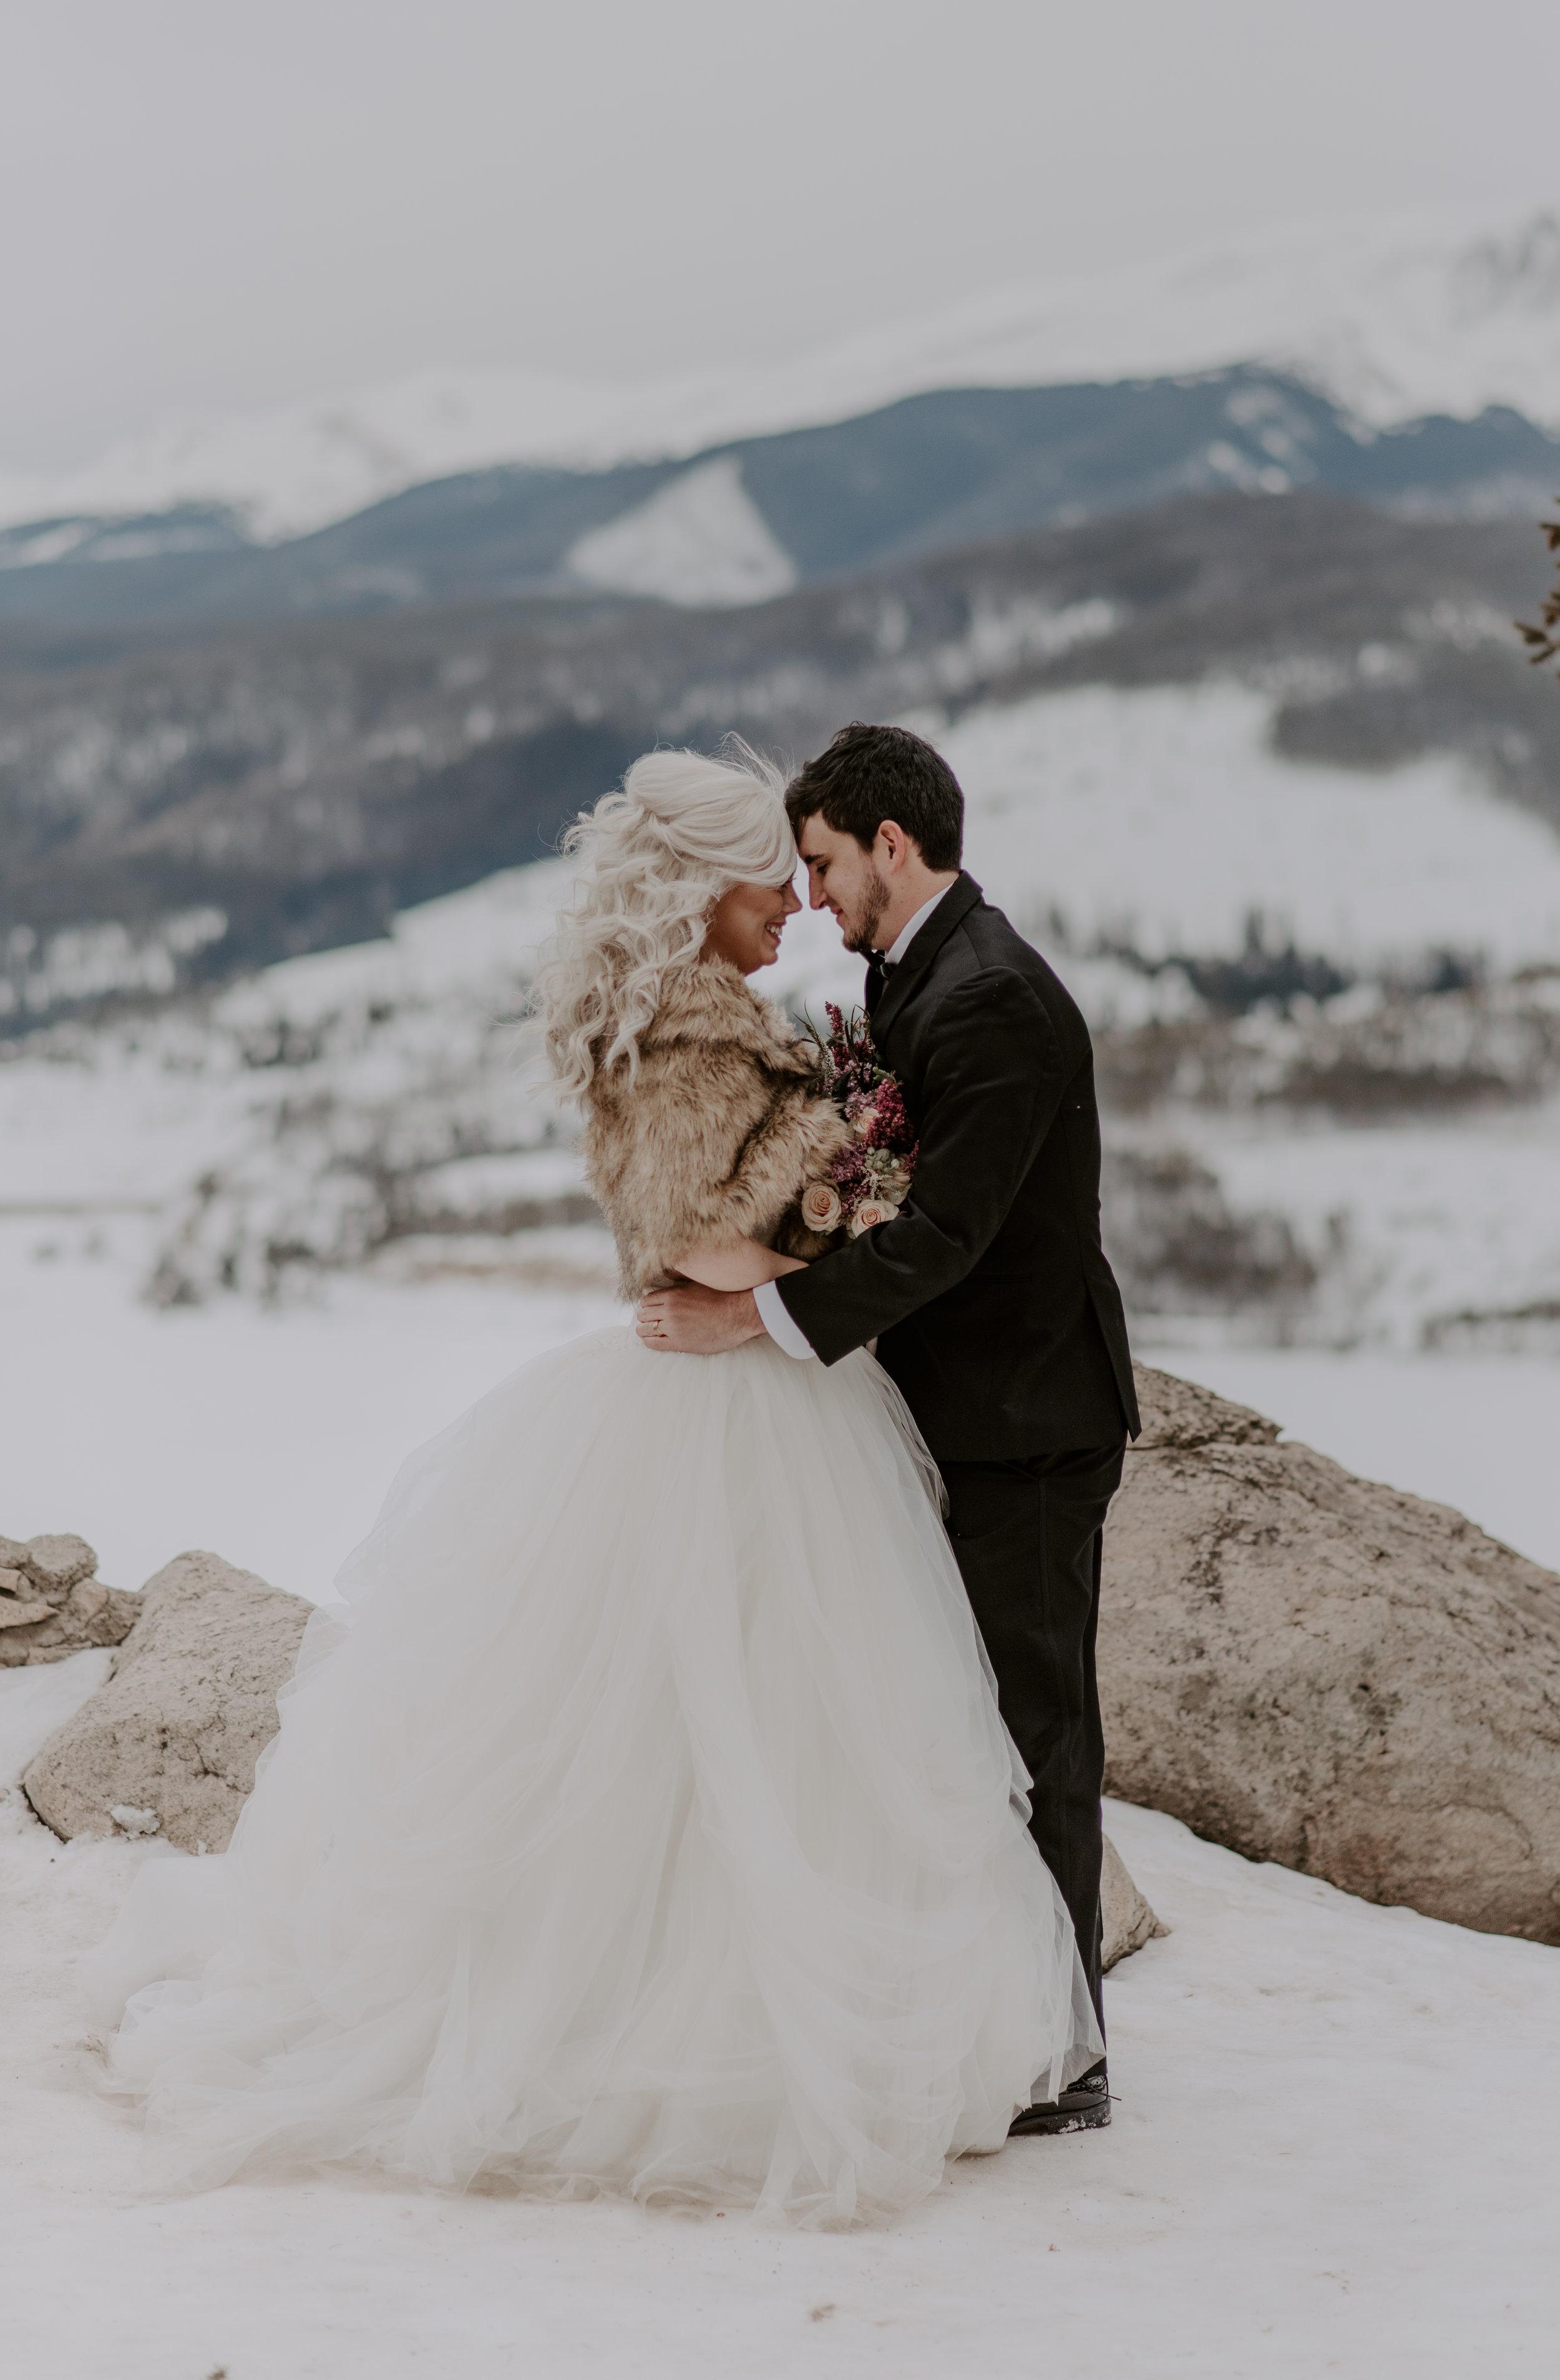 Destination elopement and wedding photographer based in Denver, Colorado.